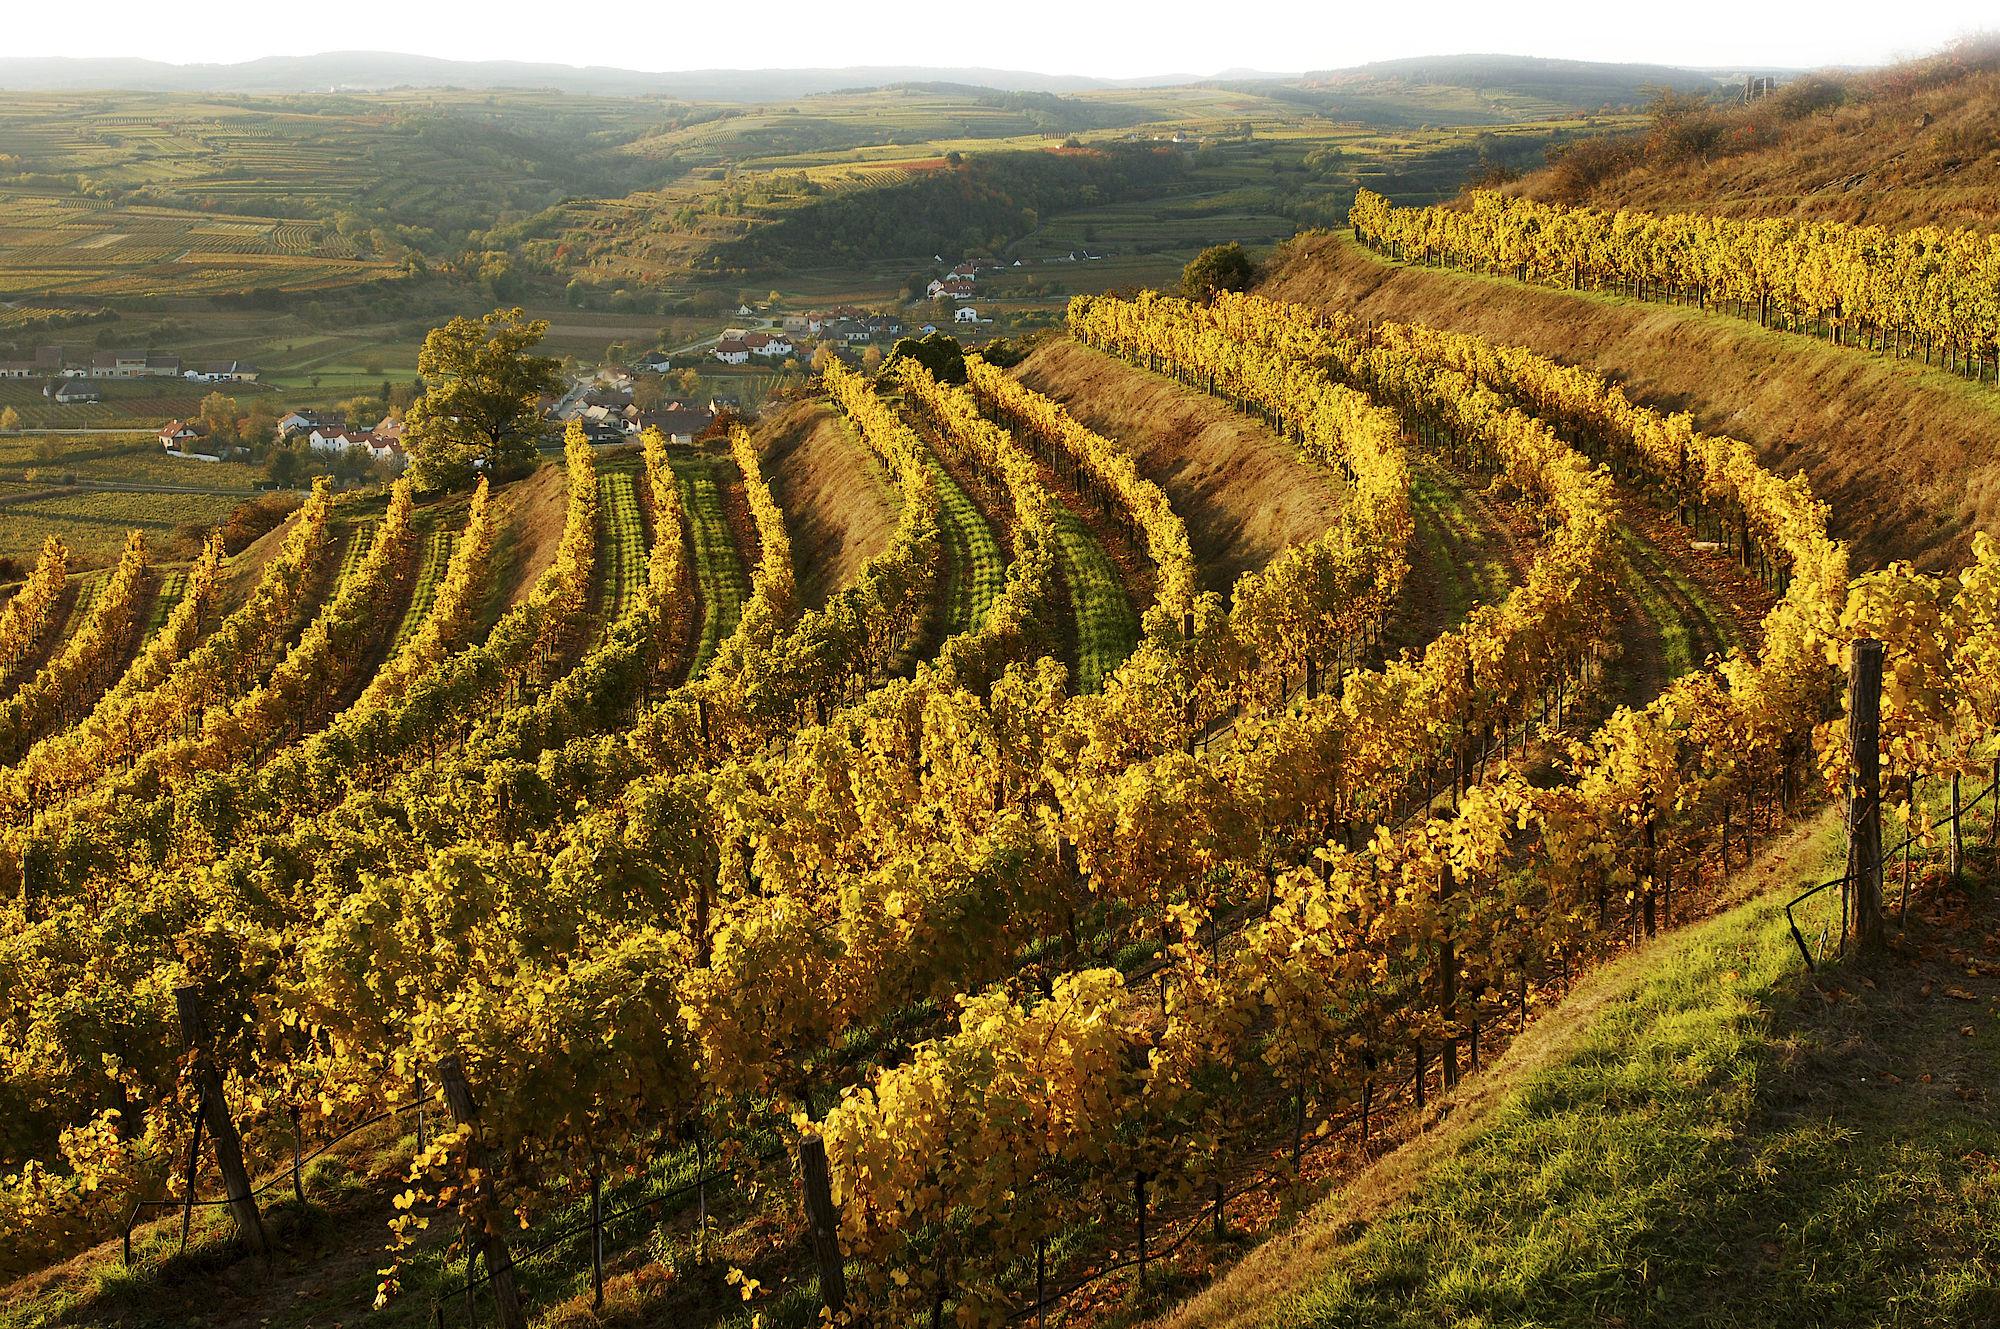 Vineyards along the Heiligentstein in the Kamptal region of Austria.